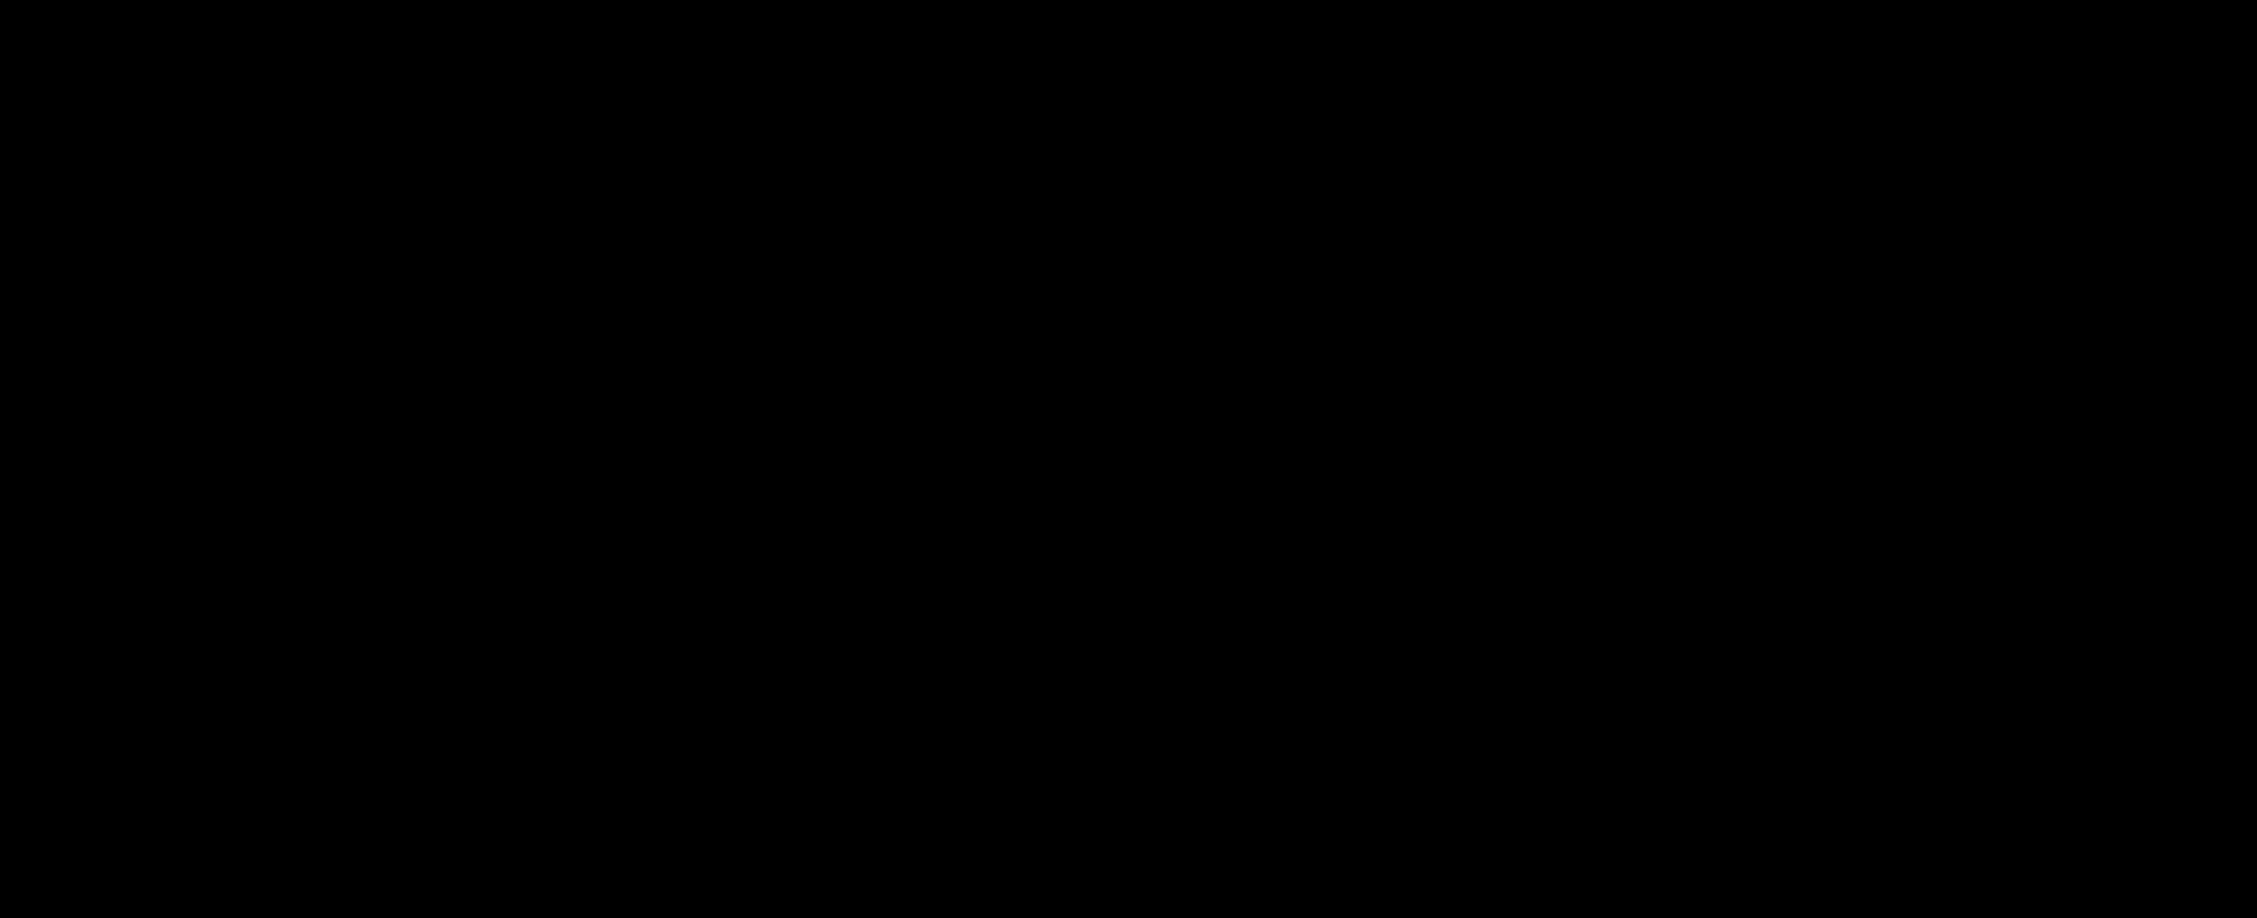 4-(4-Hydroxy-3-methoxybenzylidene)curcumin